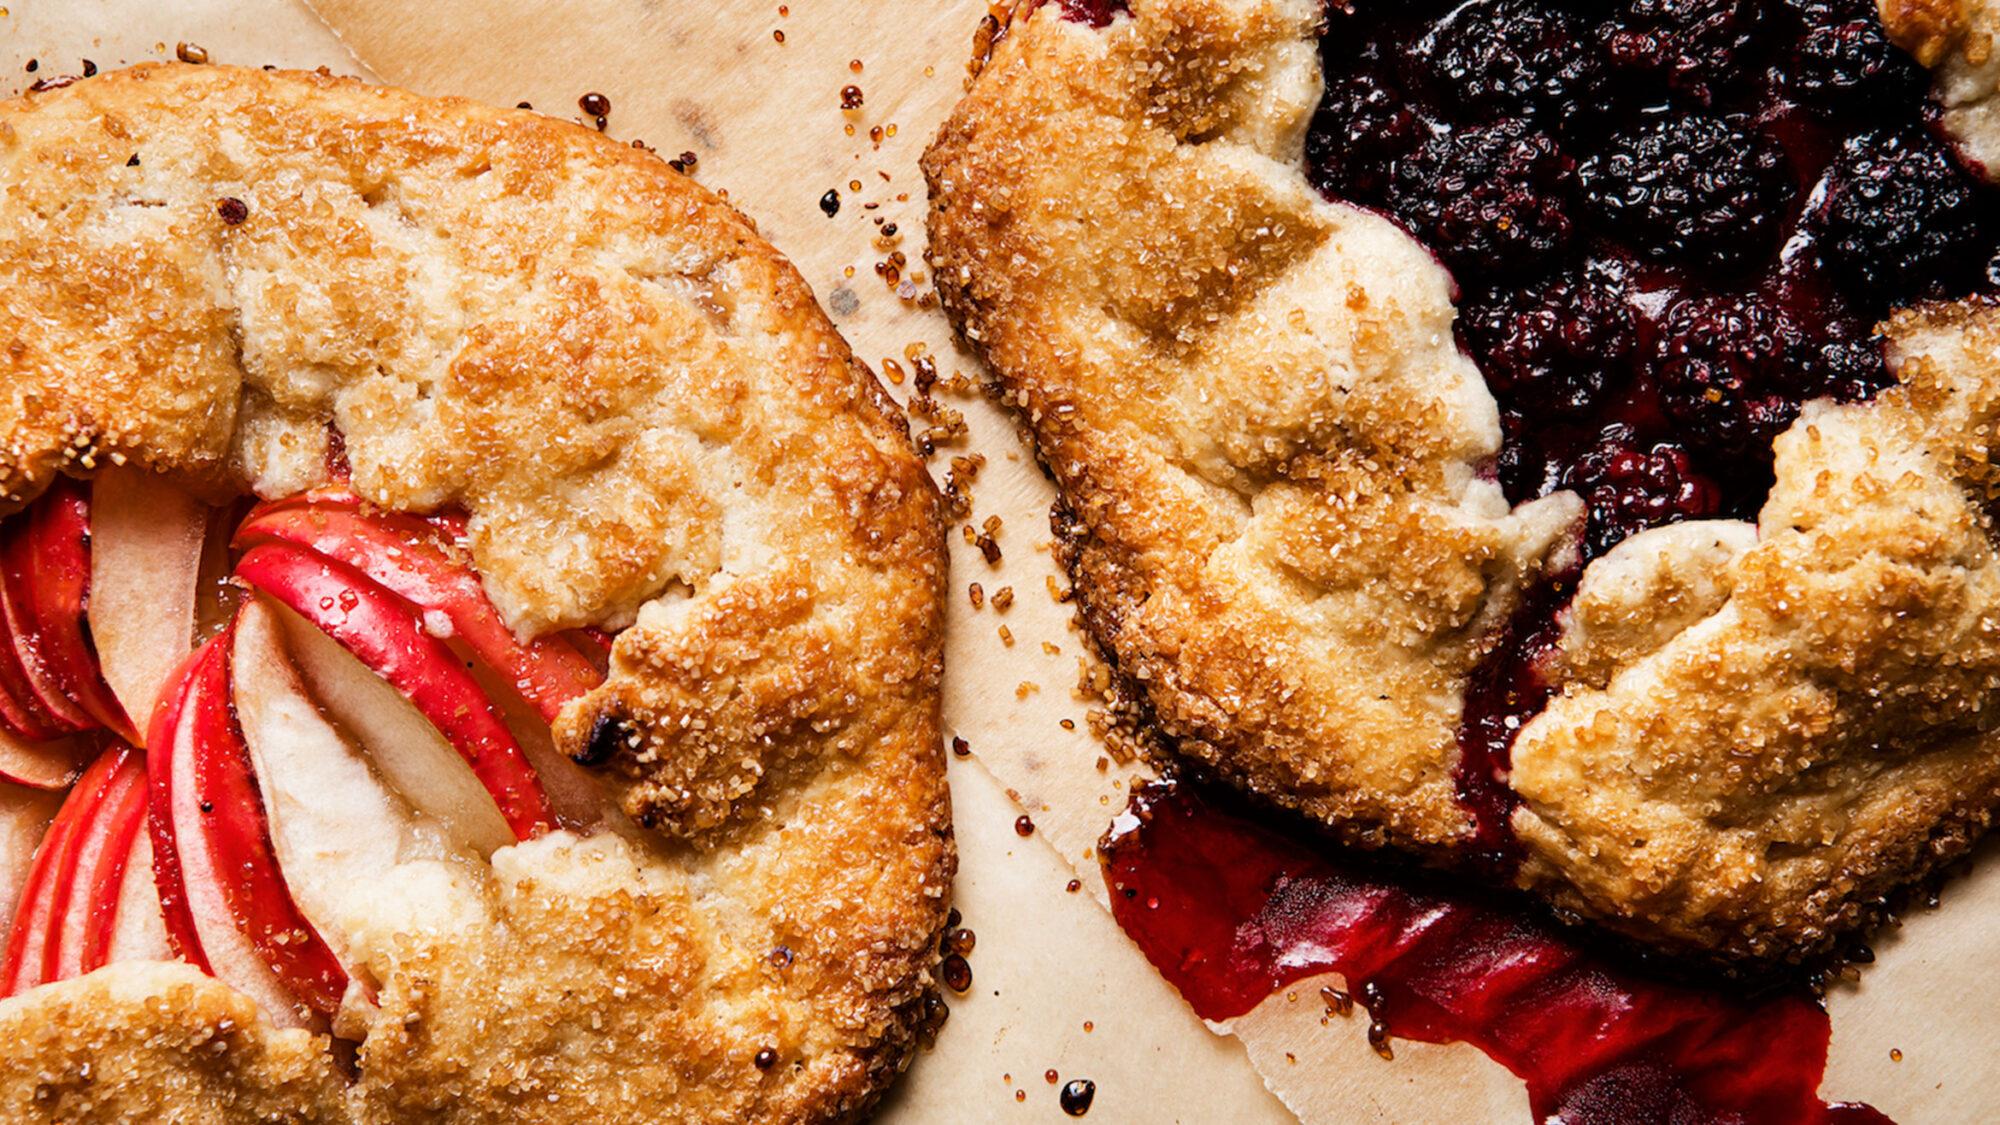 Article-Demerara-Sugar-Easy-Fruit-Crostata-Dessert-Recipe